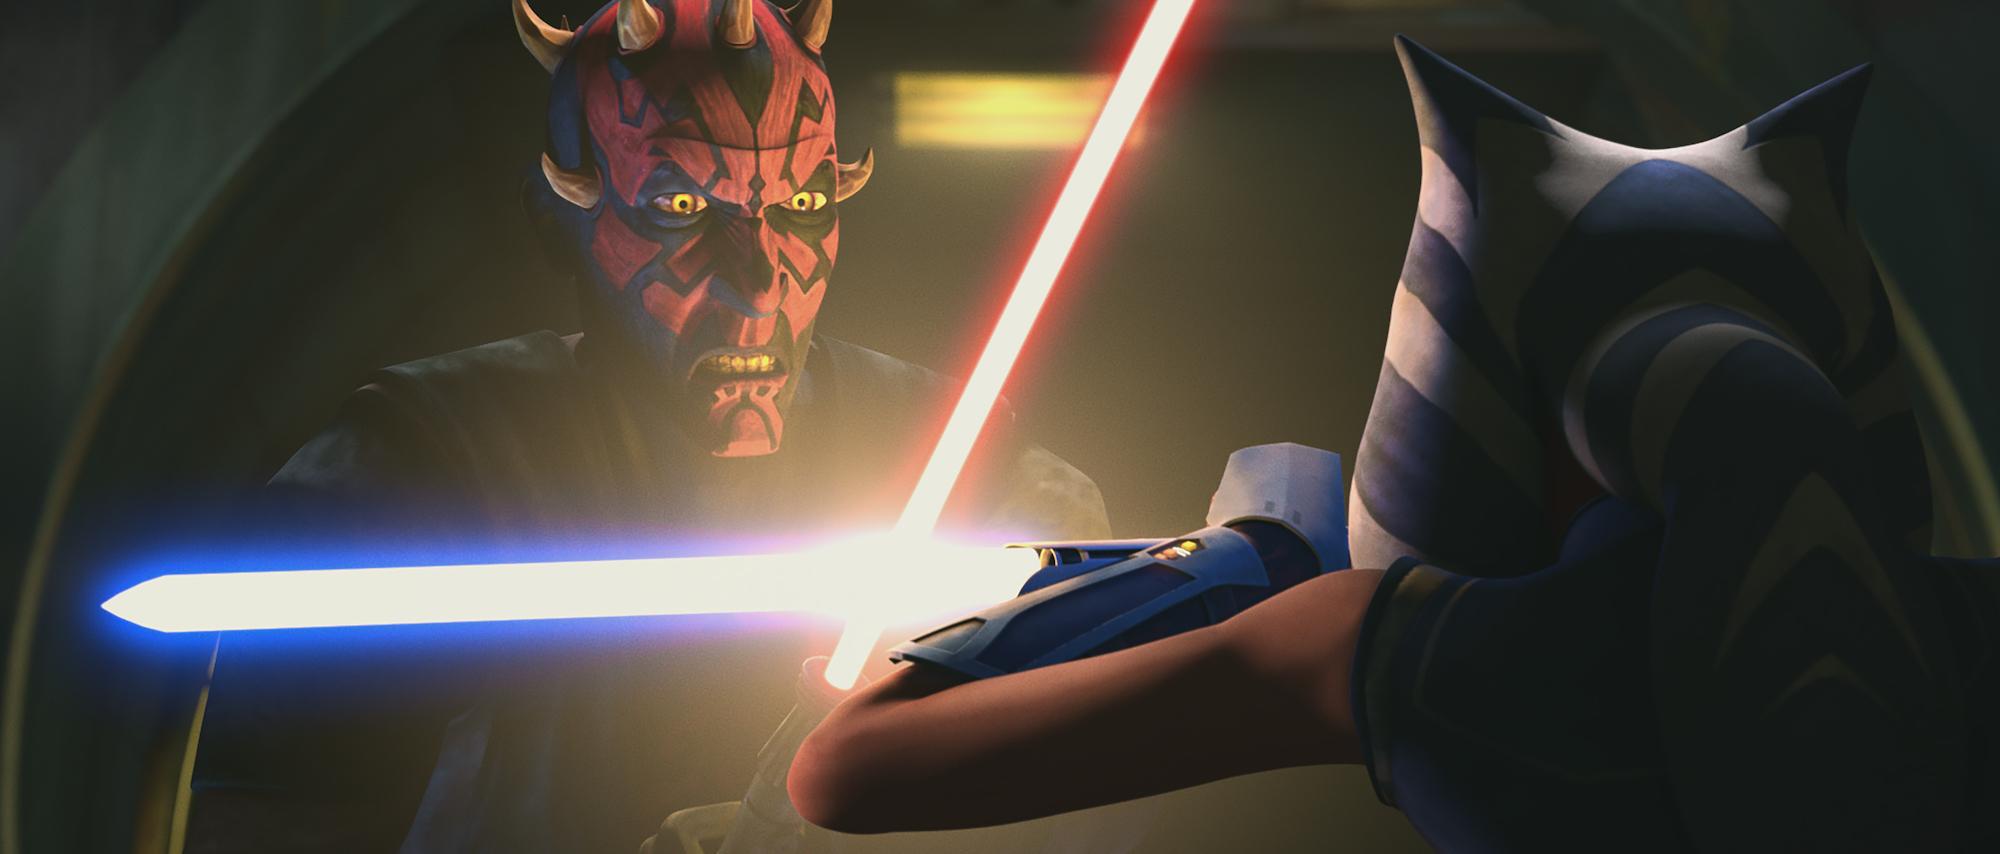 Maul faces off against Ahsoka Tano in 'Star Wars: The Clone Wars' Season 7